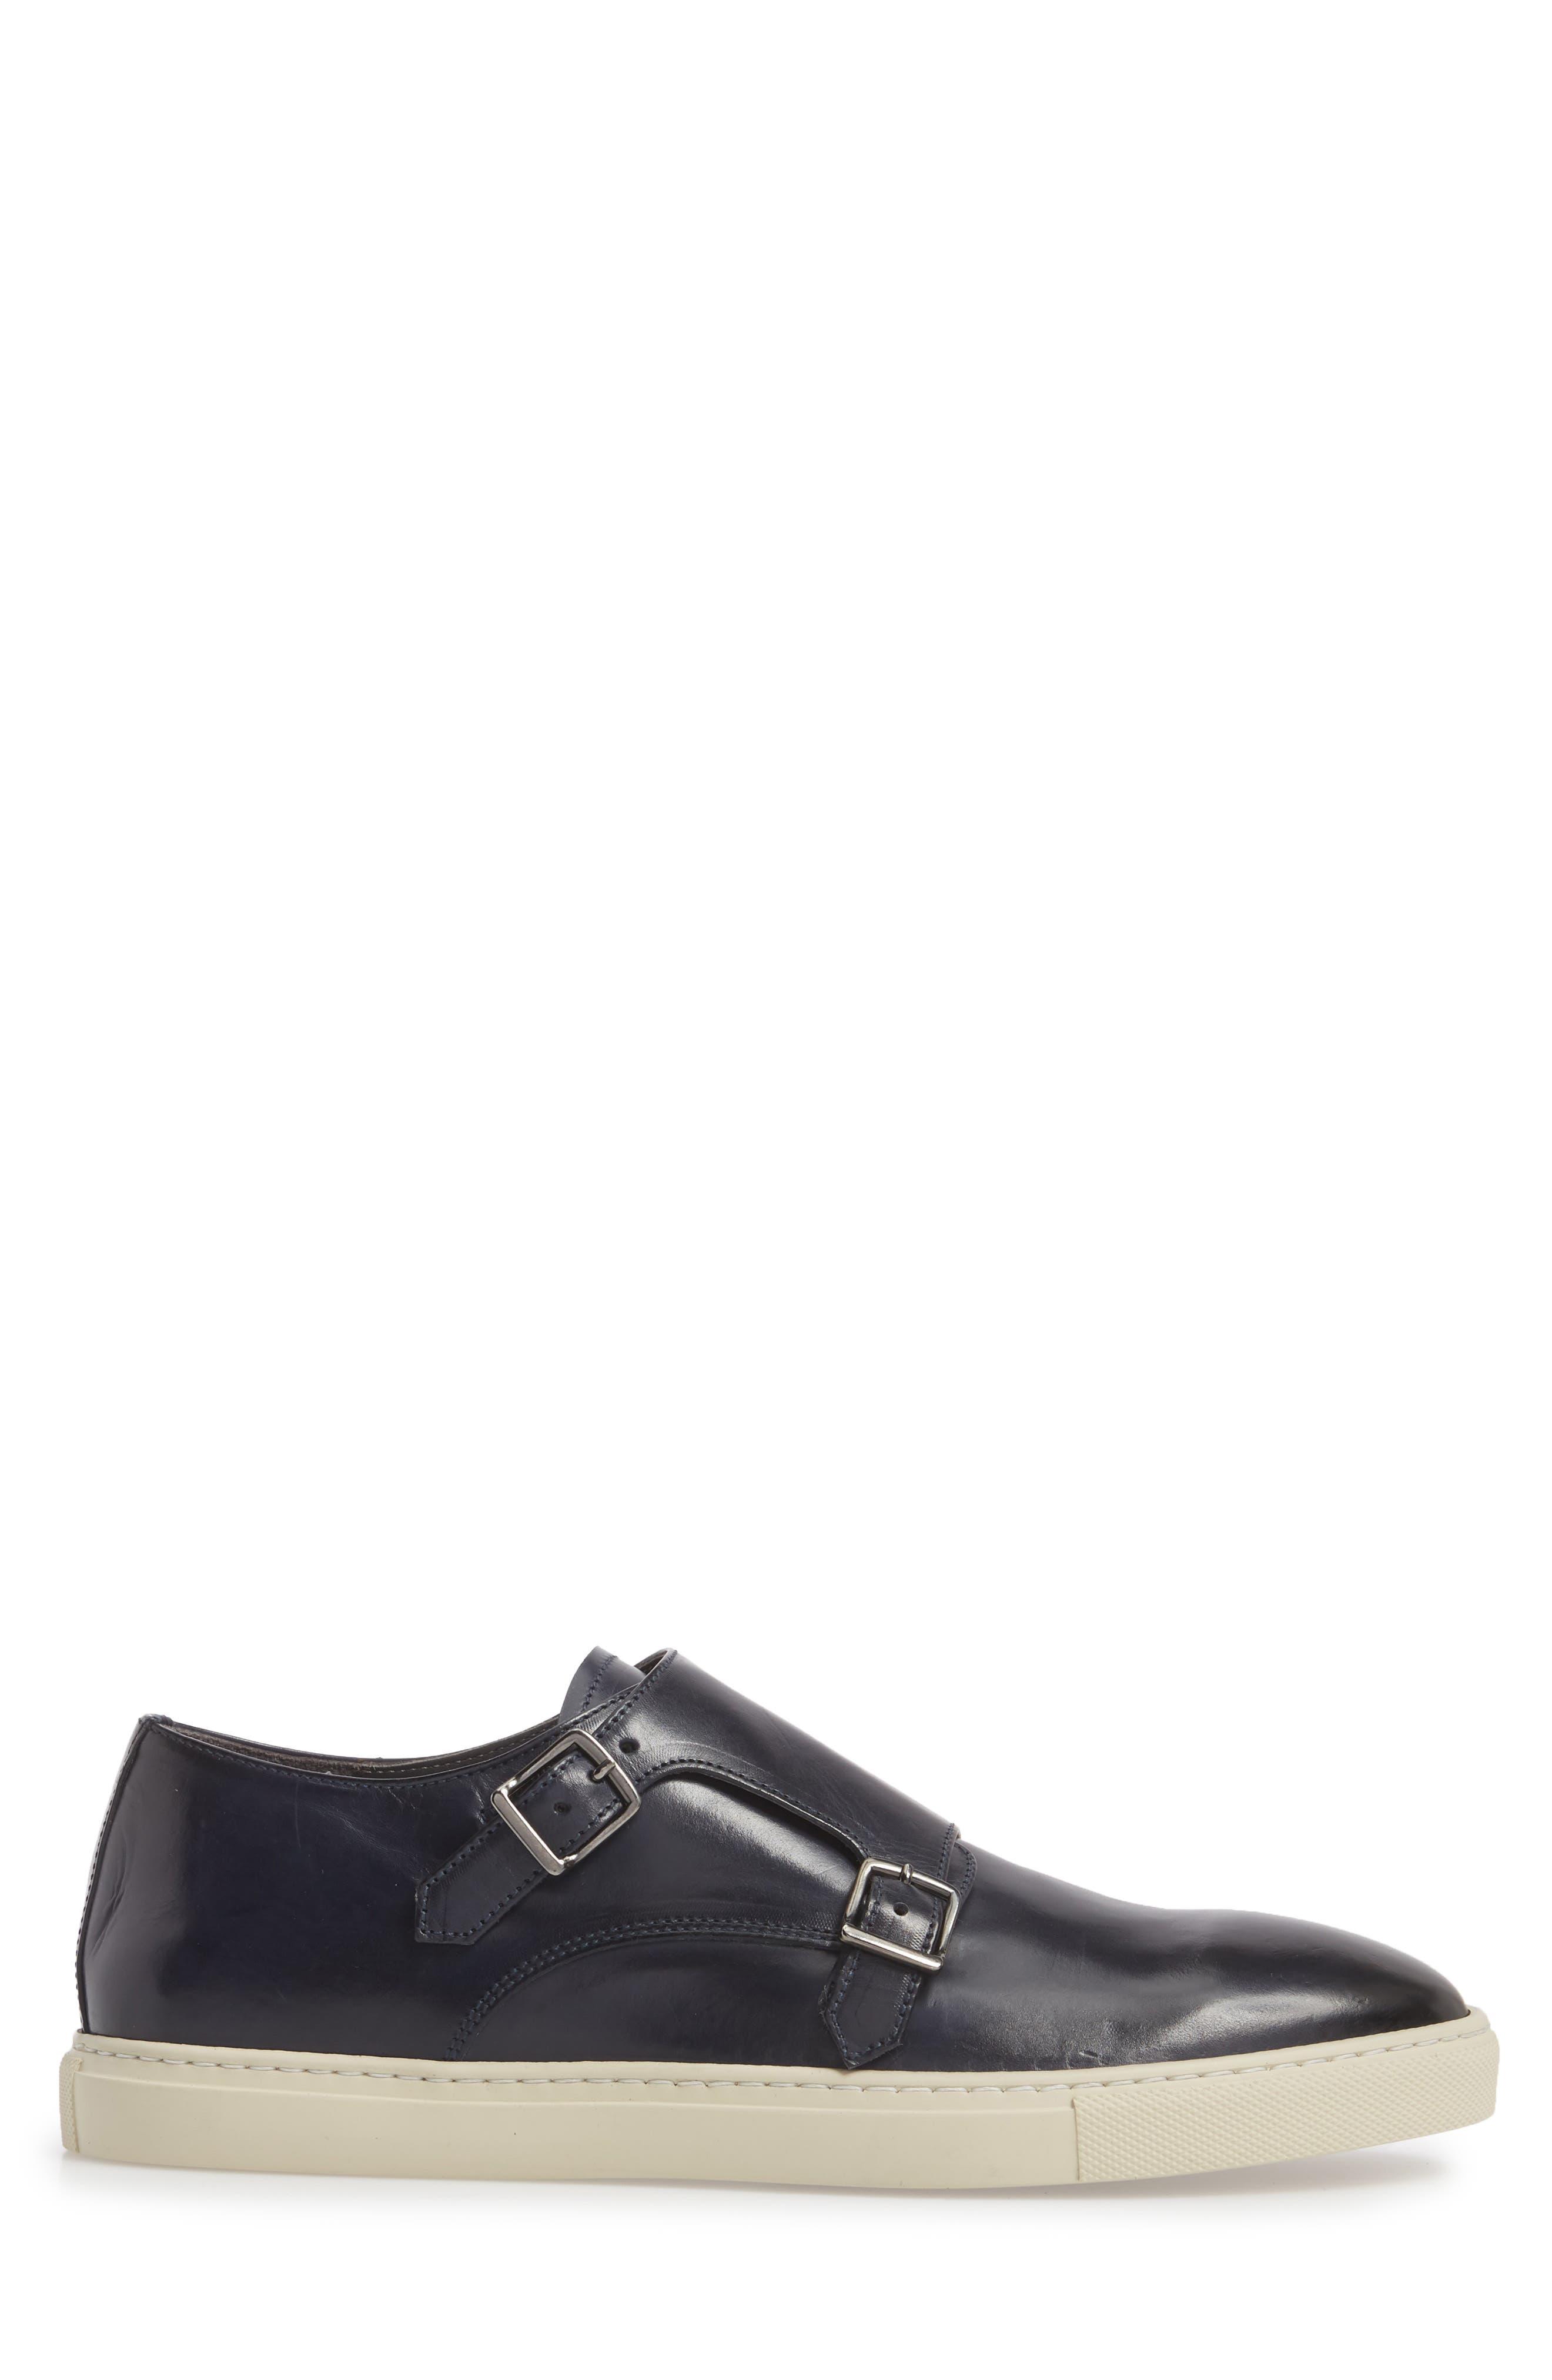 Gildden Double Monk Strap Sneaker,                             Alternate thumbnail 3, color,                             Diver Blue Marine Leather